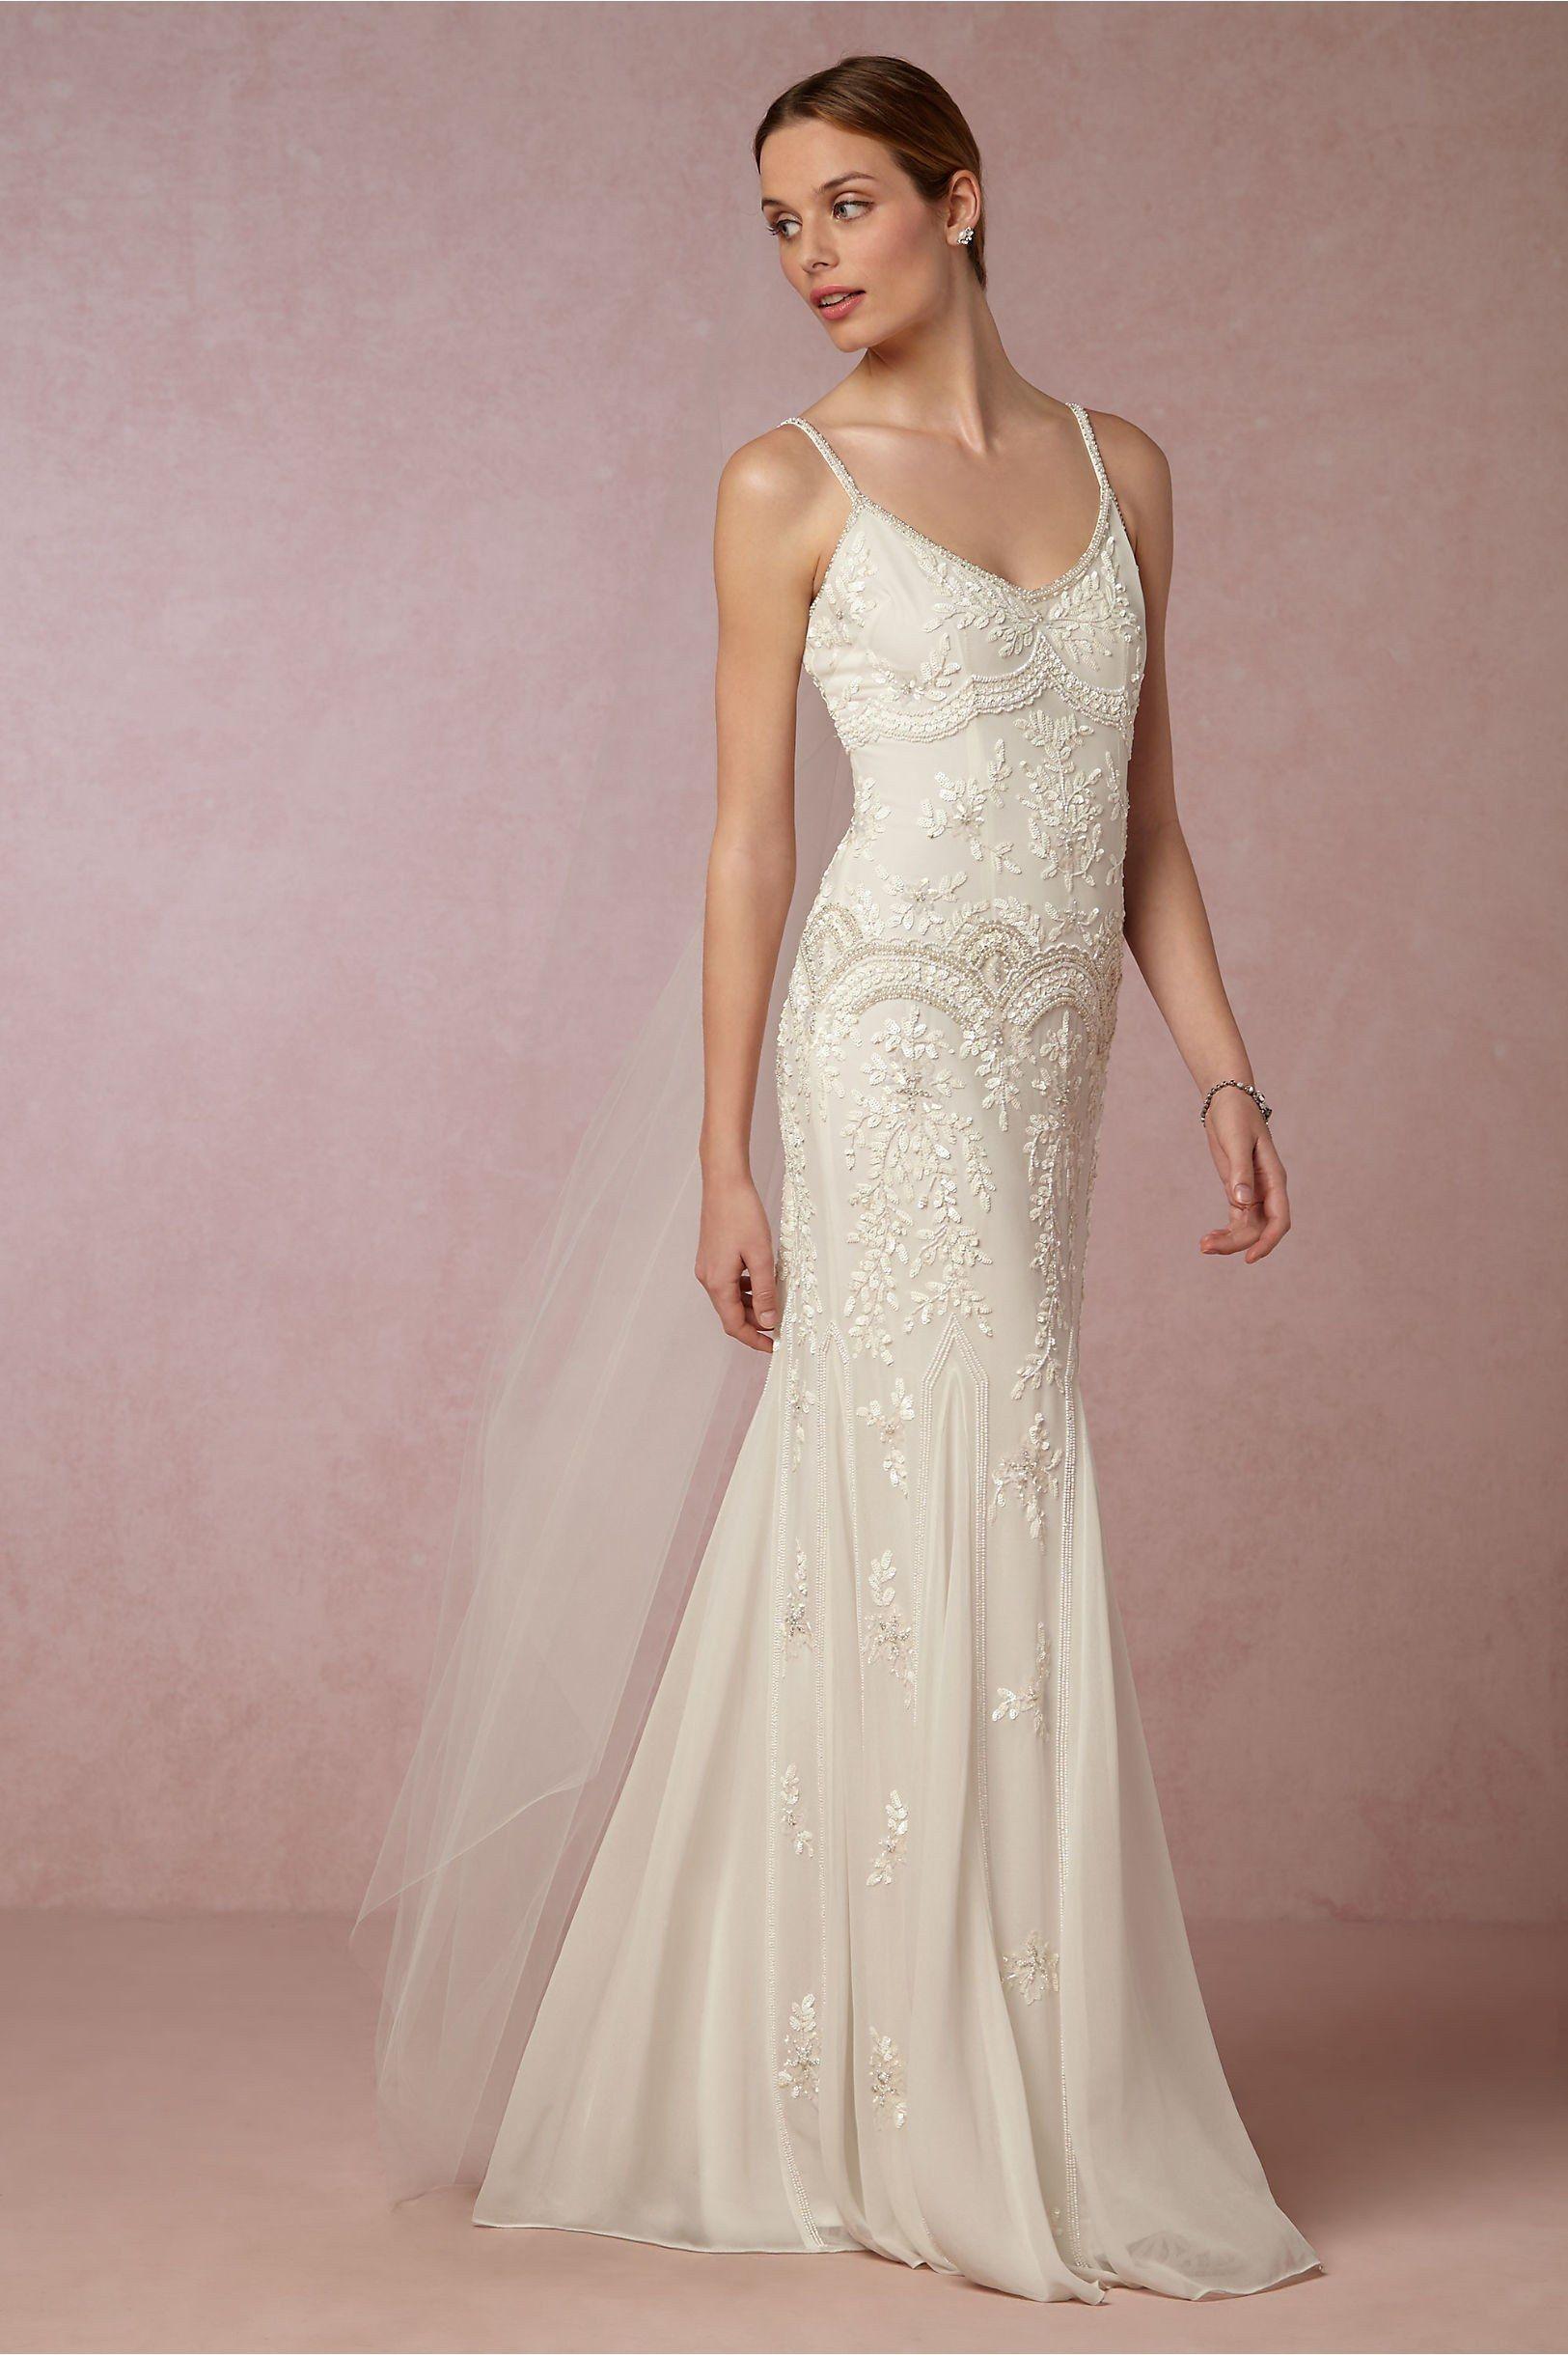 Stunning wedding dresses  Wedding Dresses Under   Affordable Wedding Dresses